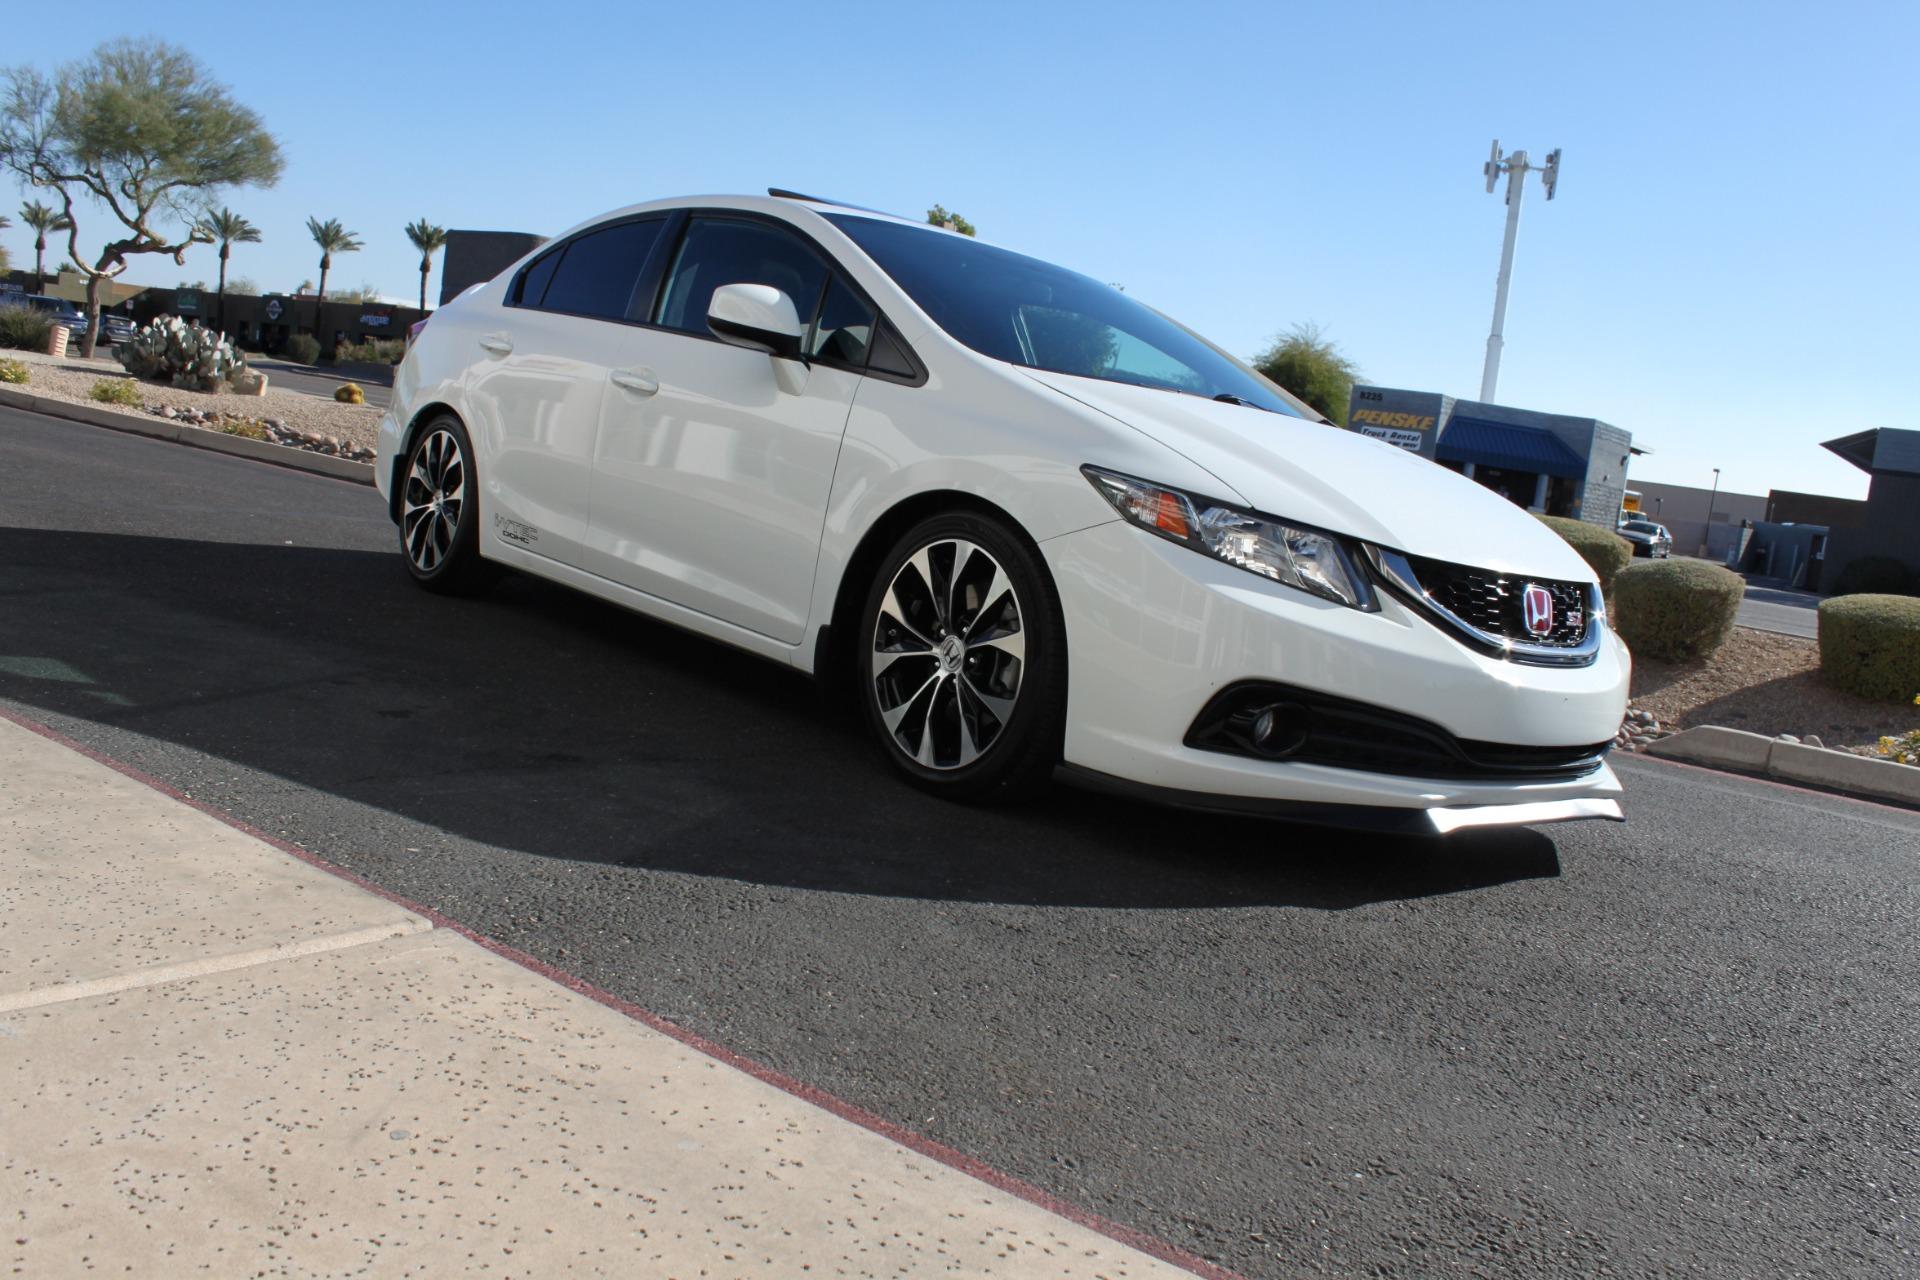 Used-2013-Honda-Civic-Sedan-Si-Chevrolet